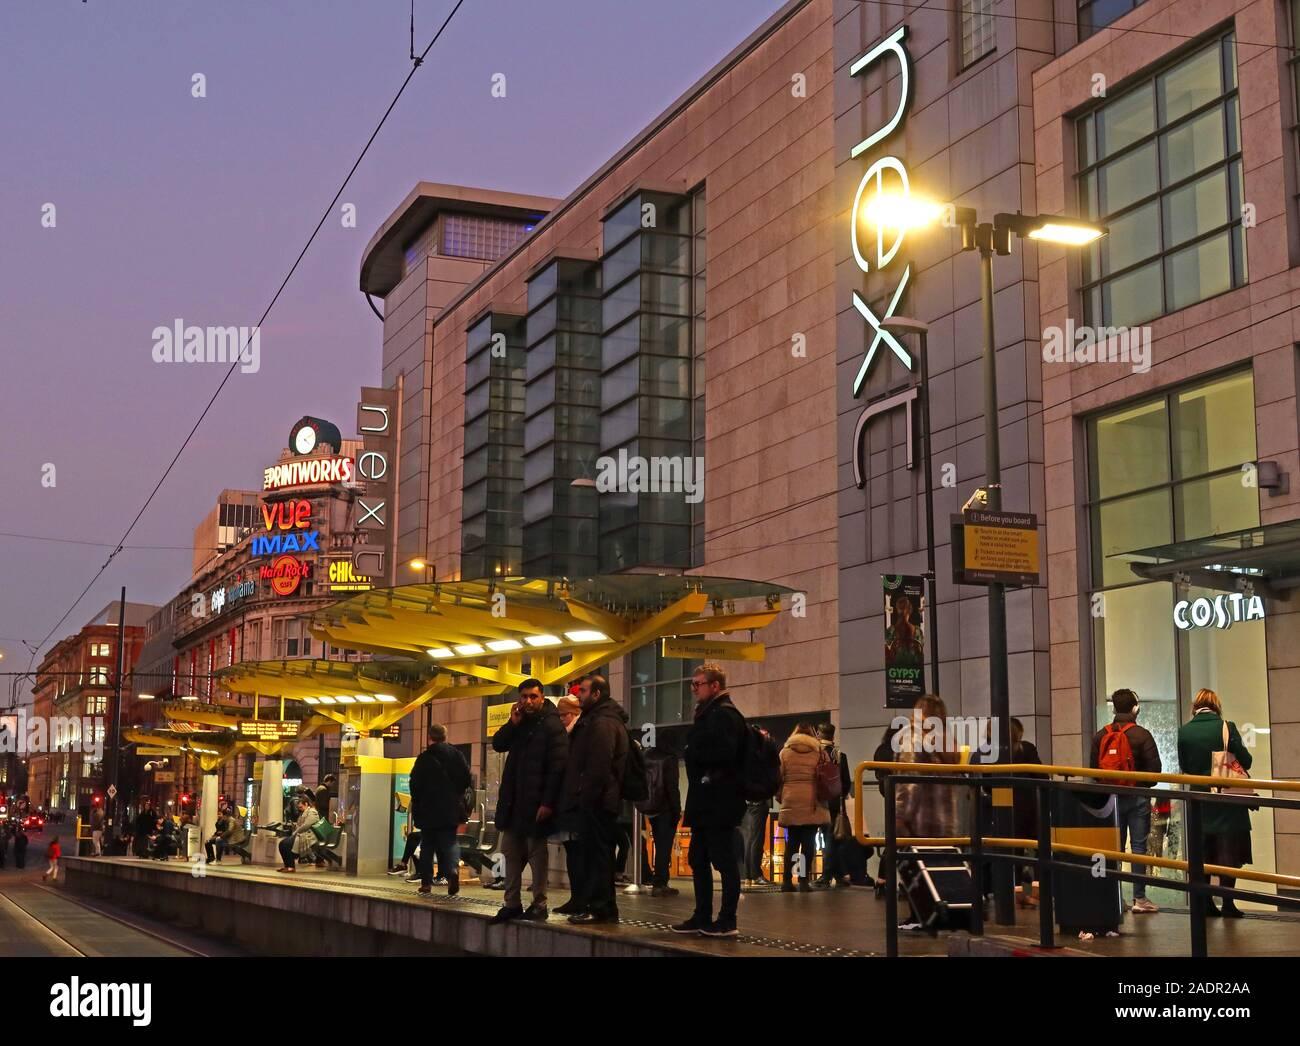 Dieses Stockfoto: Manchester Exchange Square Metrolink Straßenbahnhaltestelle, neben Arndale Shopping Centre, Next, City Centre, Manchester, England, UK, in der Dämmerung - 2ADR2A